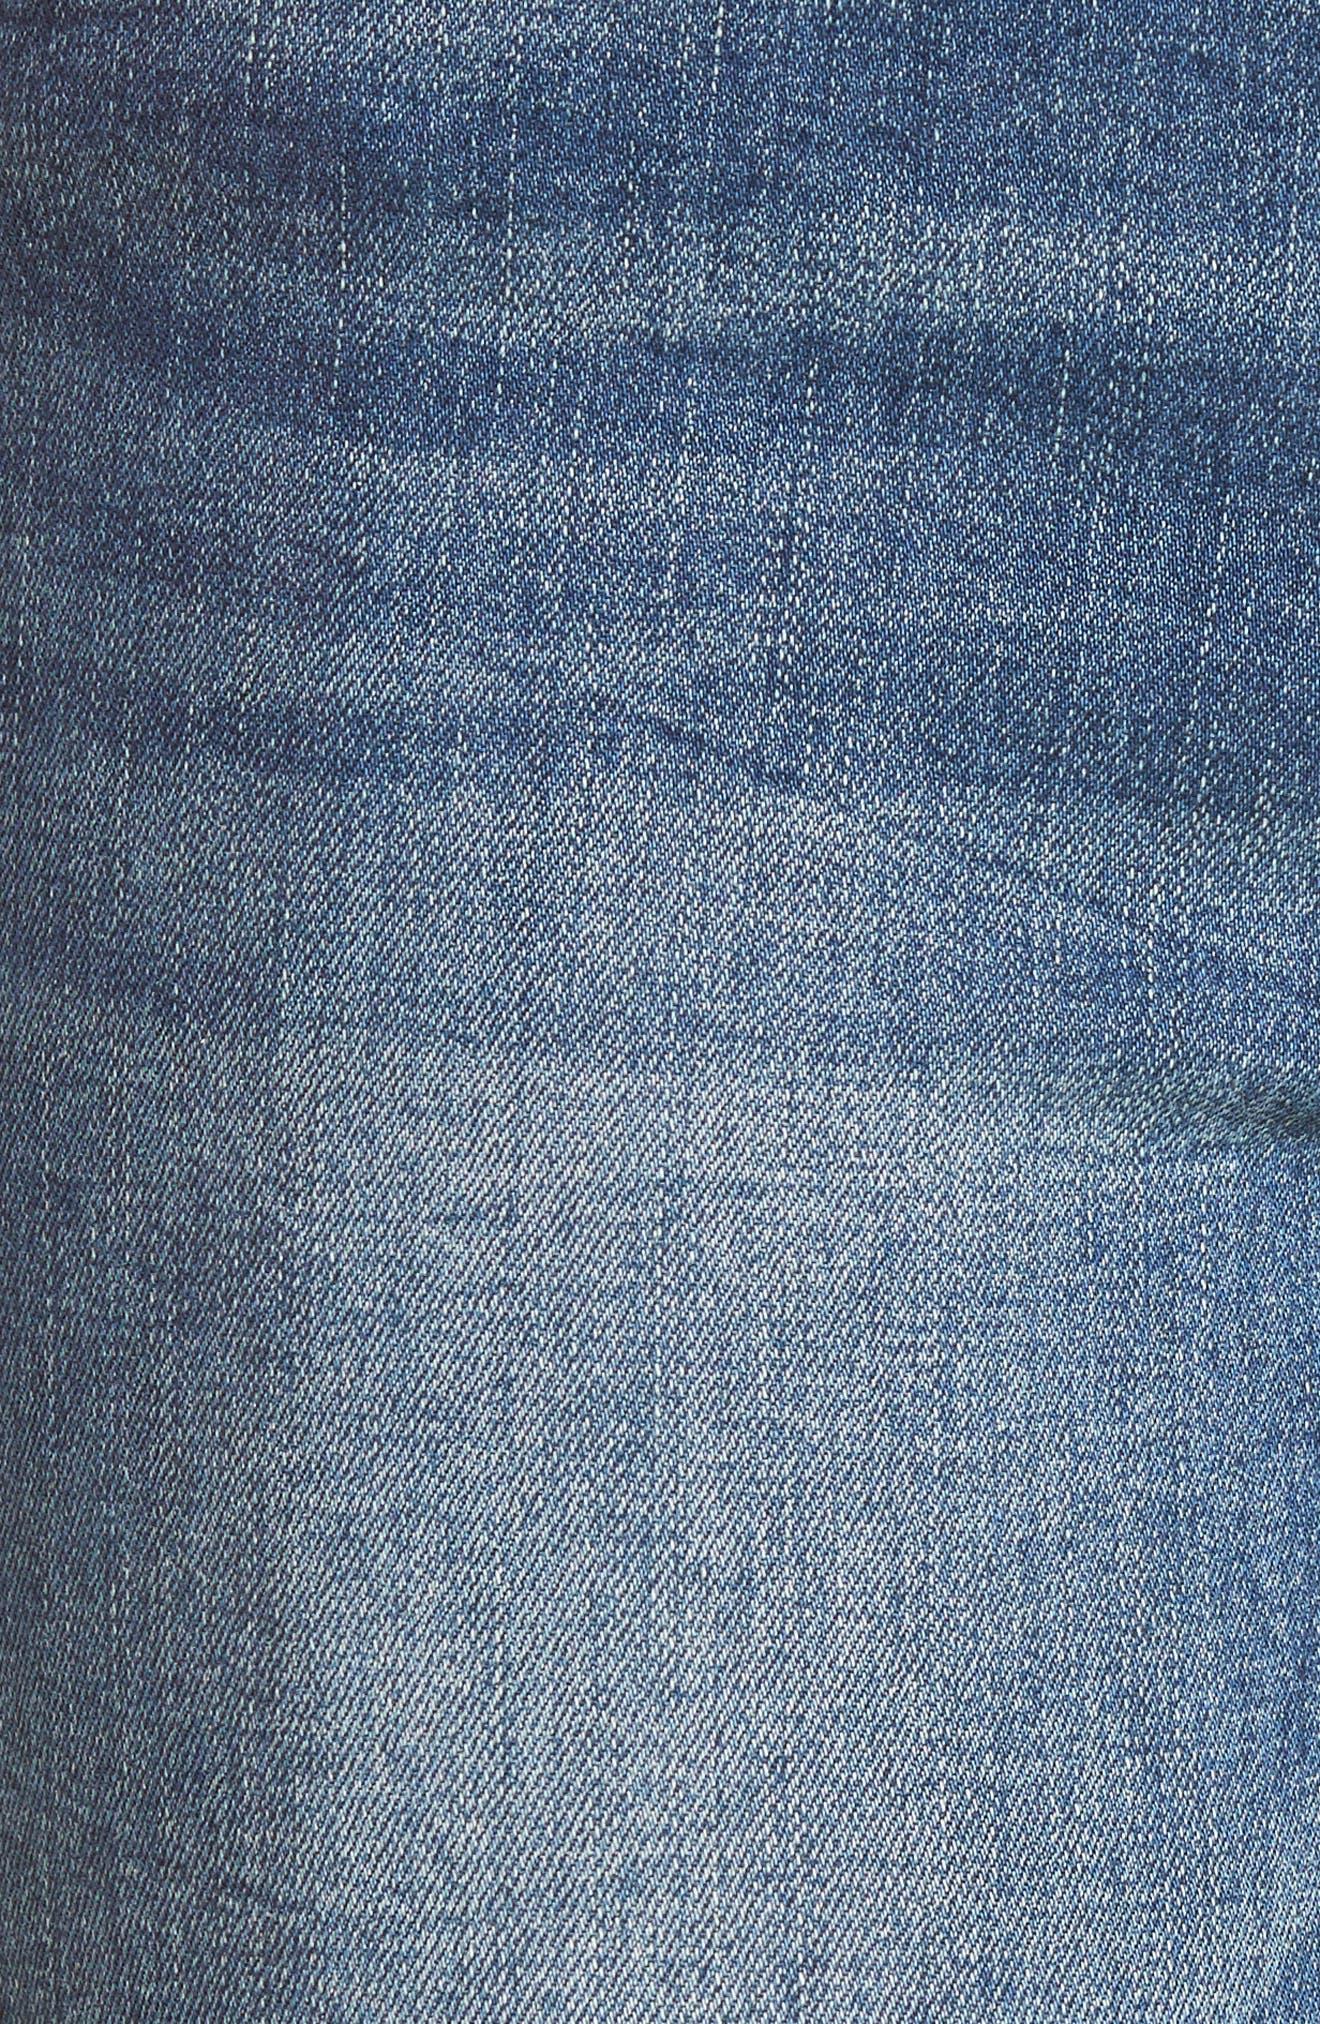 Cry Baby Raw Hem High Waist Skinny Jeans,                             Alternate thumbnail 6, color,                             Sake Bomb